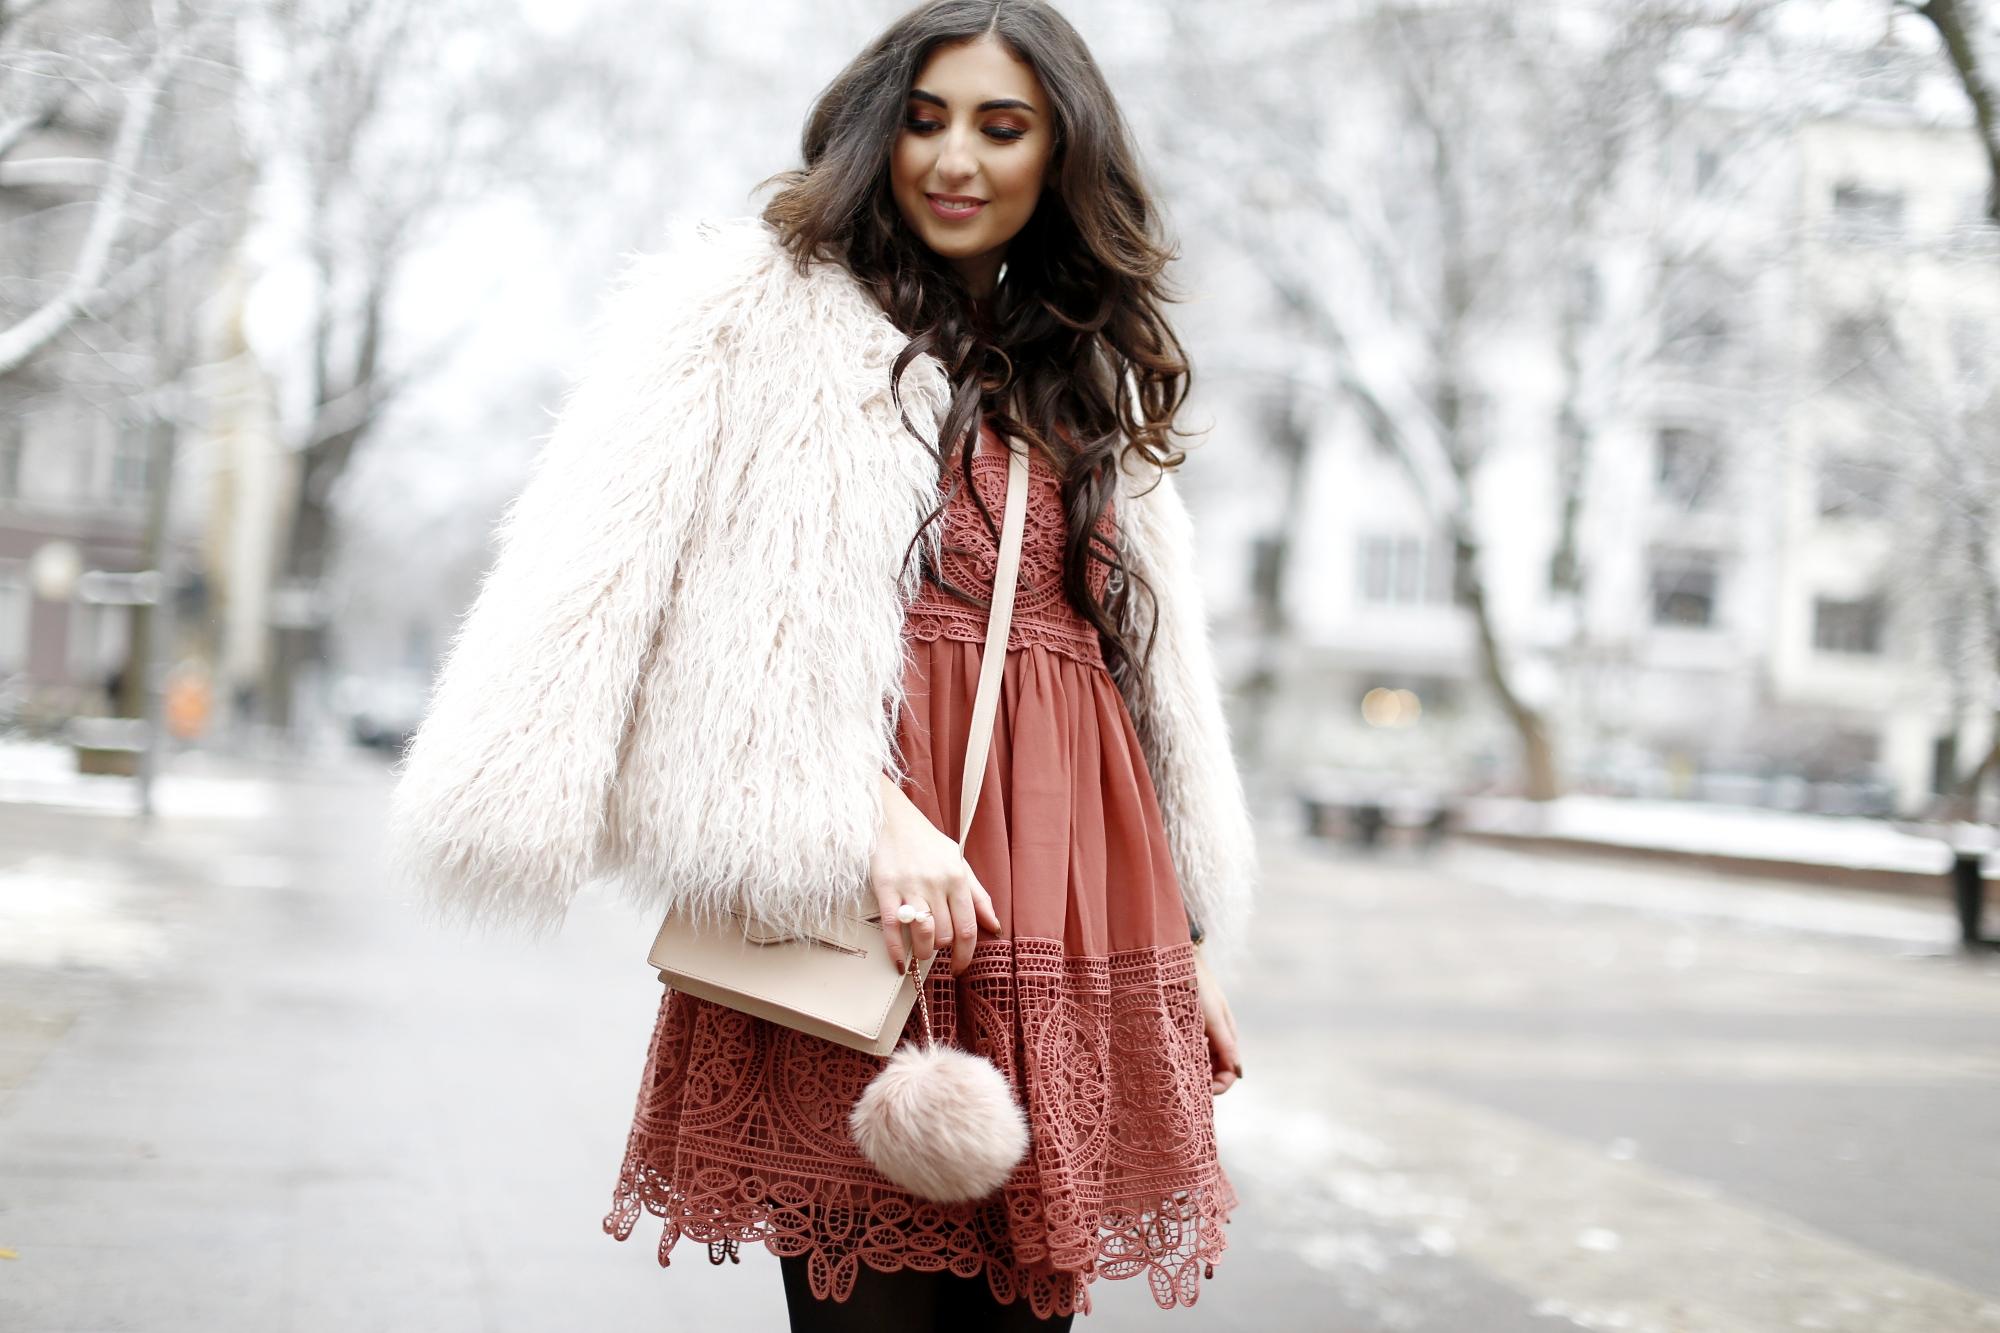 Winter Birthday Outfit asos lace dress rust dress vikings look inspiration zara faux fur jacket geburtstags outfit winter herbst samieze streetstyle